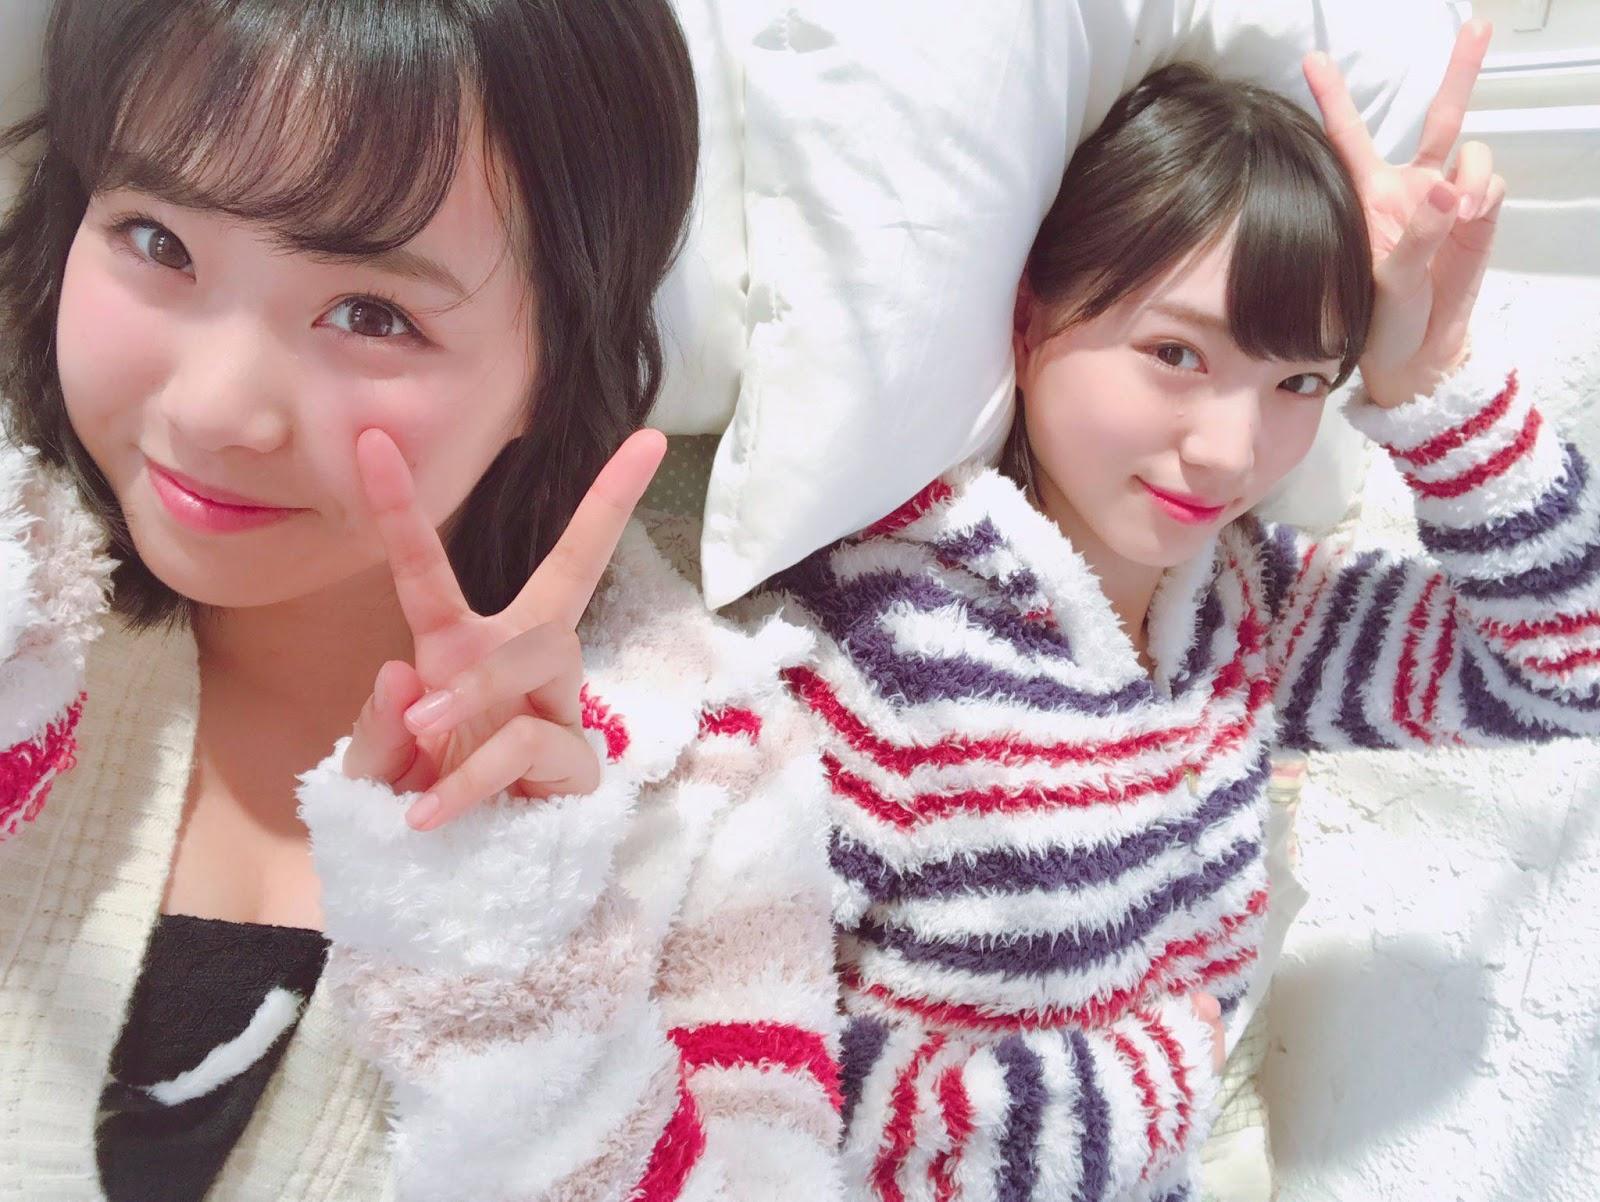 Ota Yuuri 太田夢莉, Kato Yuuka 加藤夕夏 NMB48, FLASH Special Gravure BEST 2017 Winter (FLASH スペシャルグラビア BEST 2017 冬号)